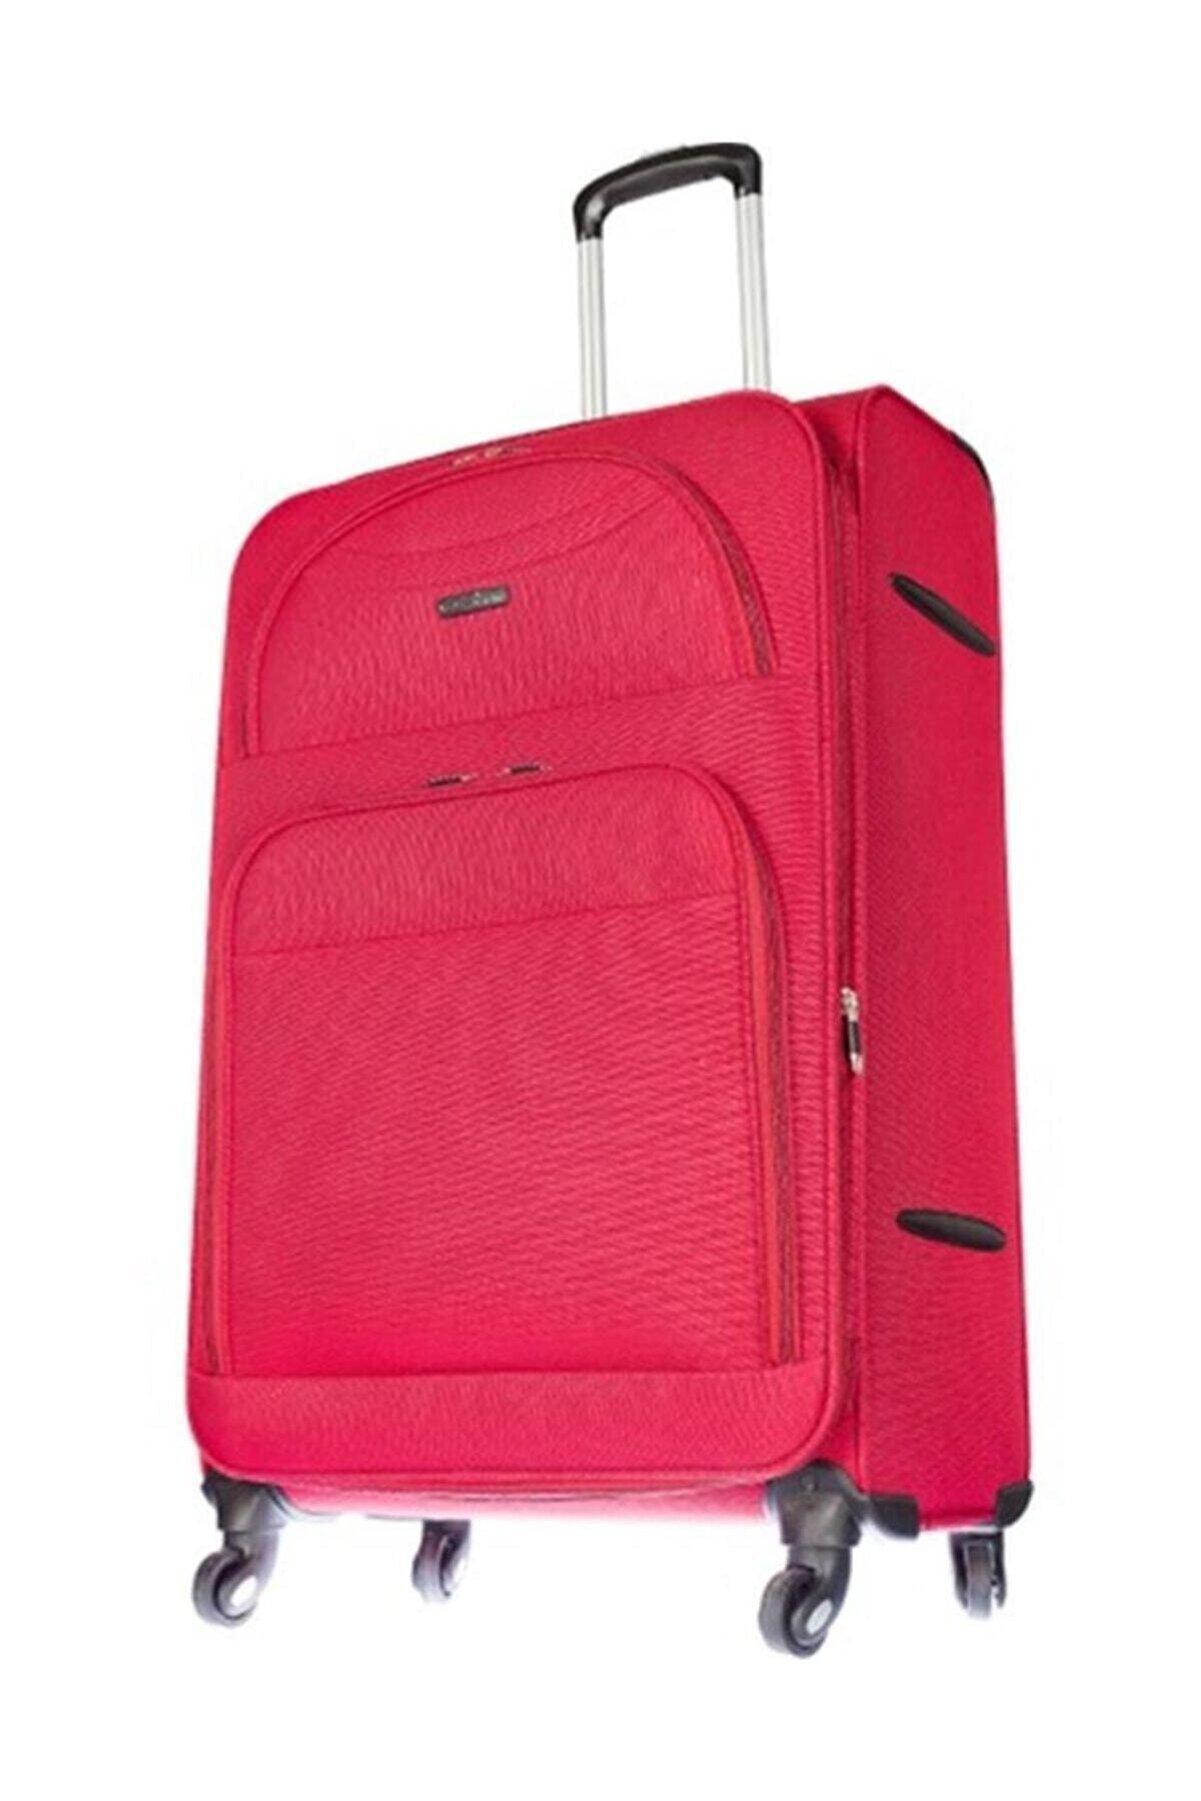 ÇÇS Kumaş Büyük Boy Valiz 409-l Kırmızı